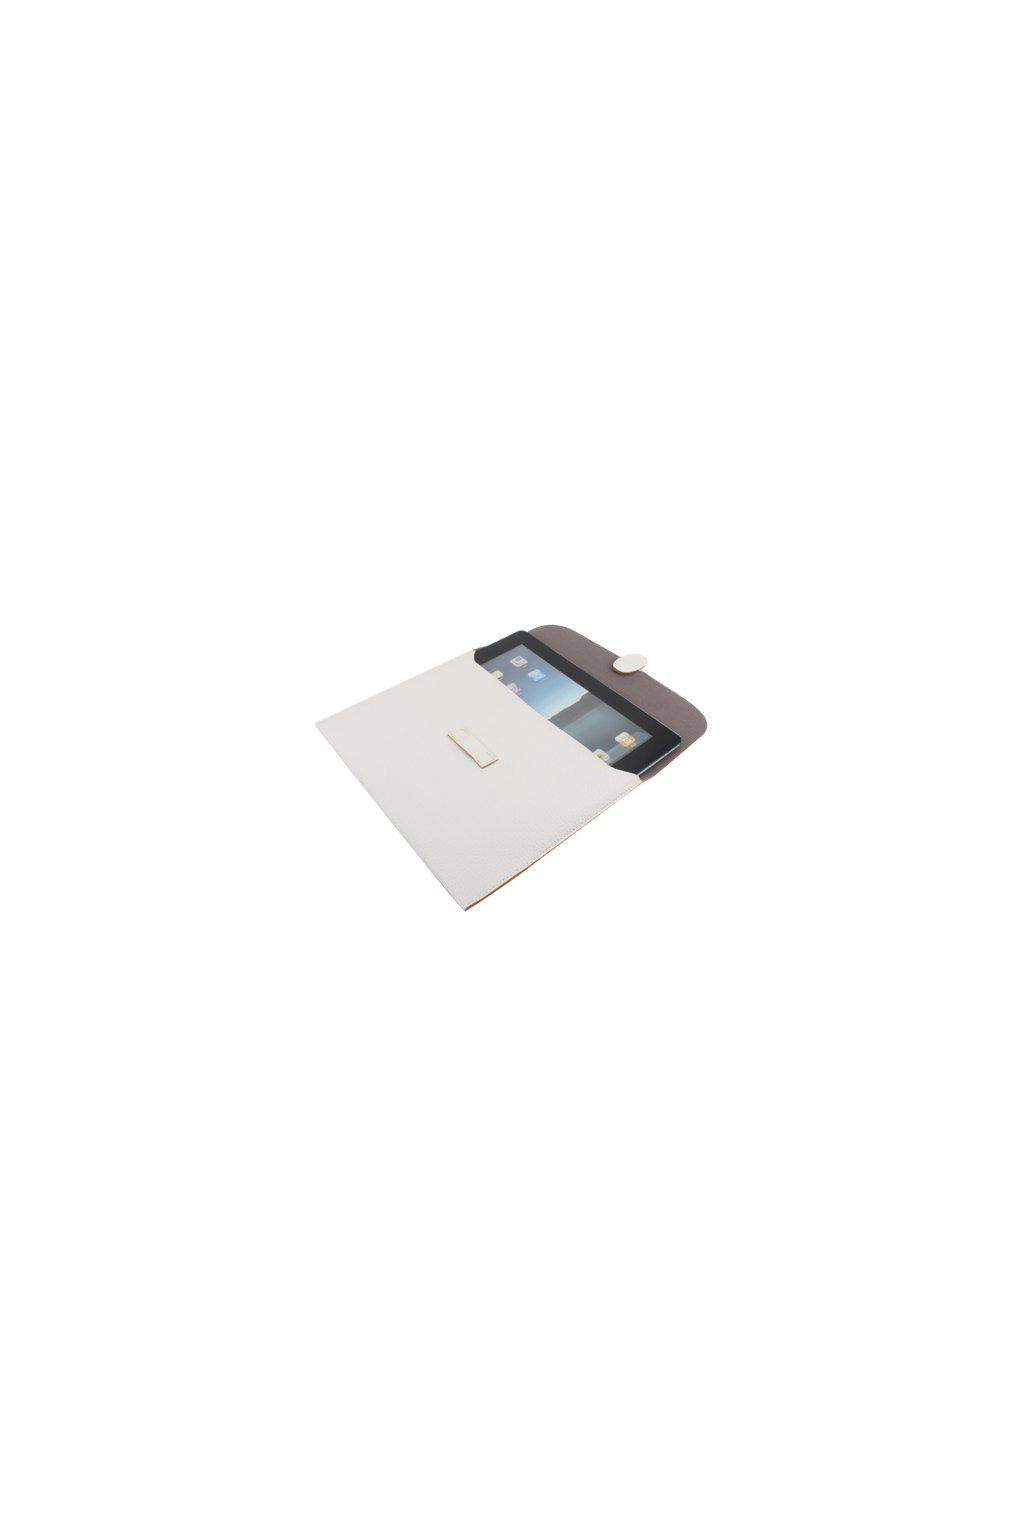 Pouzdro Omo iPad 2/3/4/Air, white/bílá